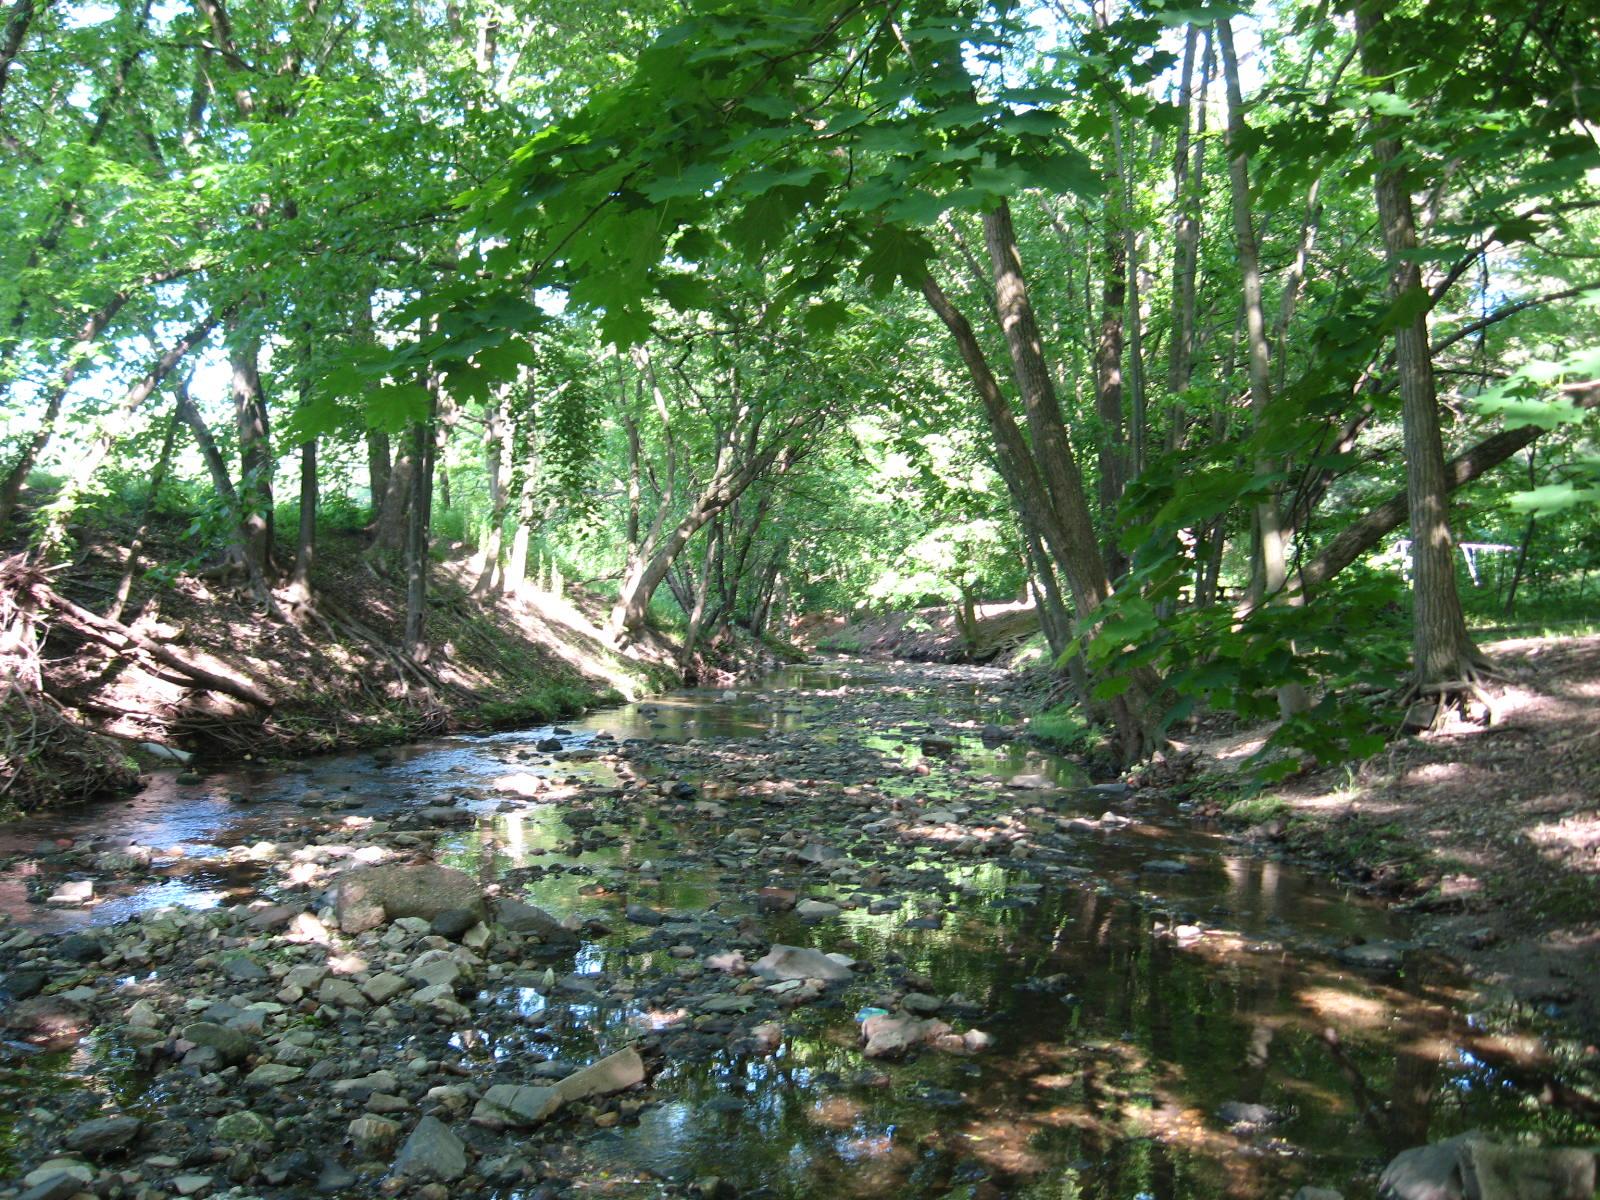 Tookany Creek in Glenside, PA